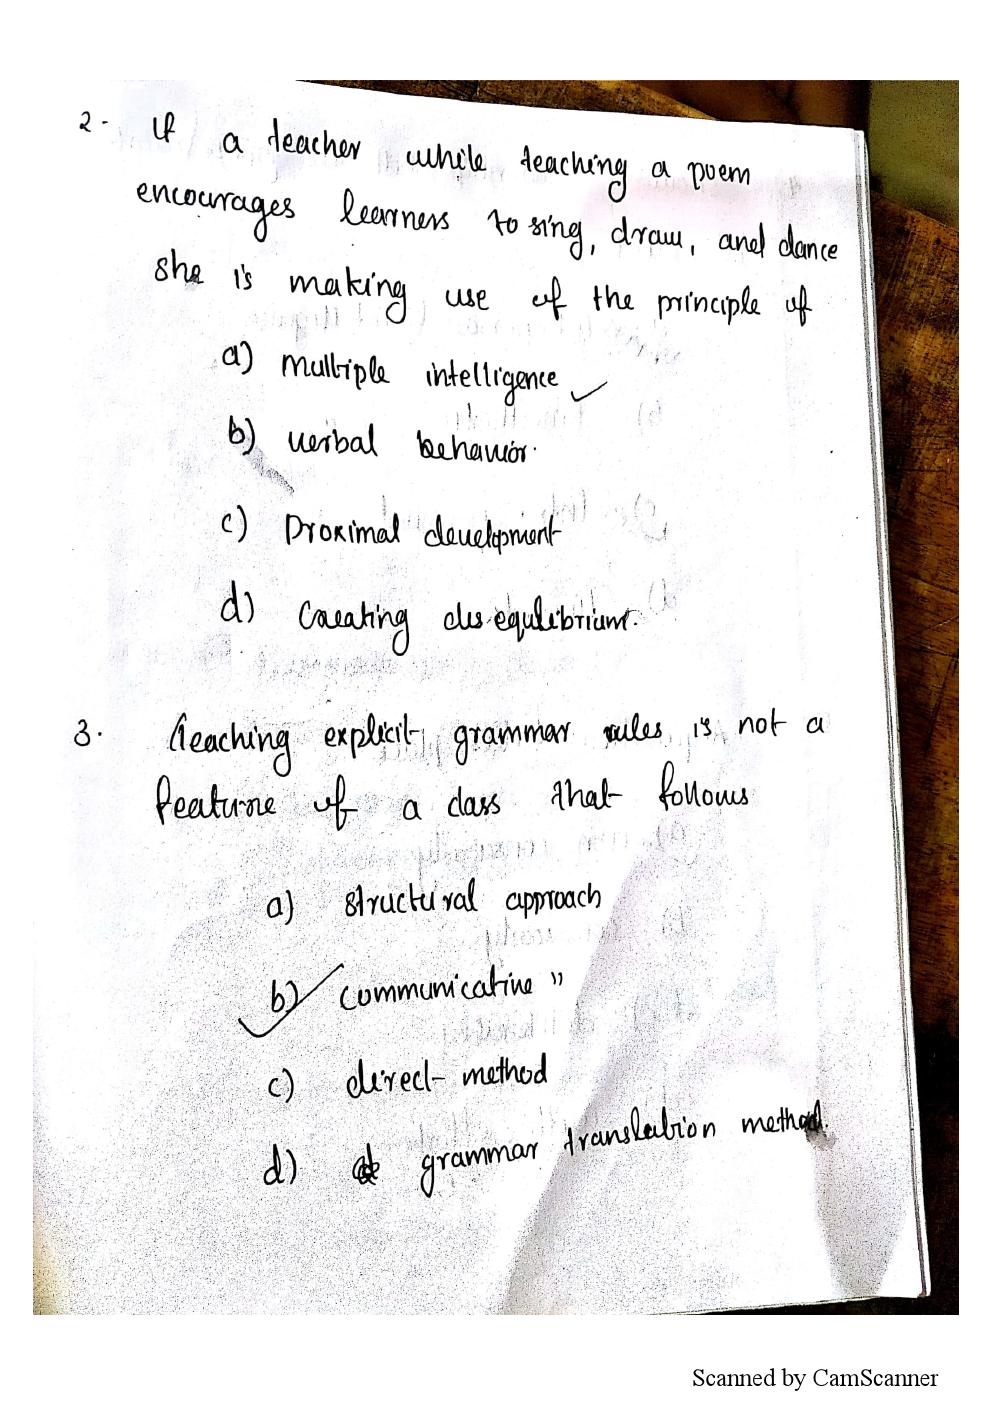 http://masterstudy.net/pdf/ktet_notes0070.png